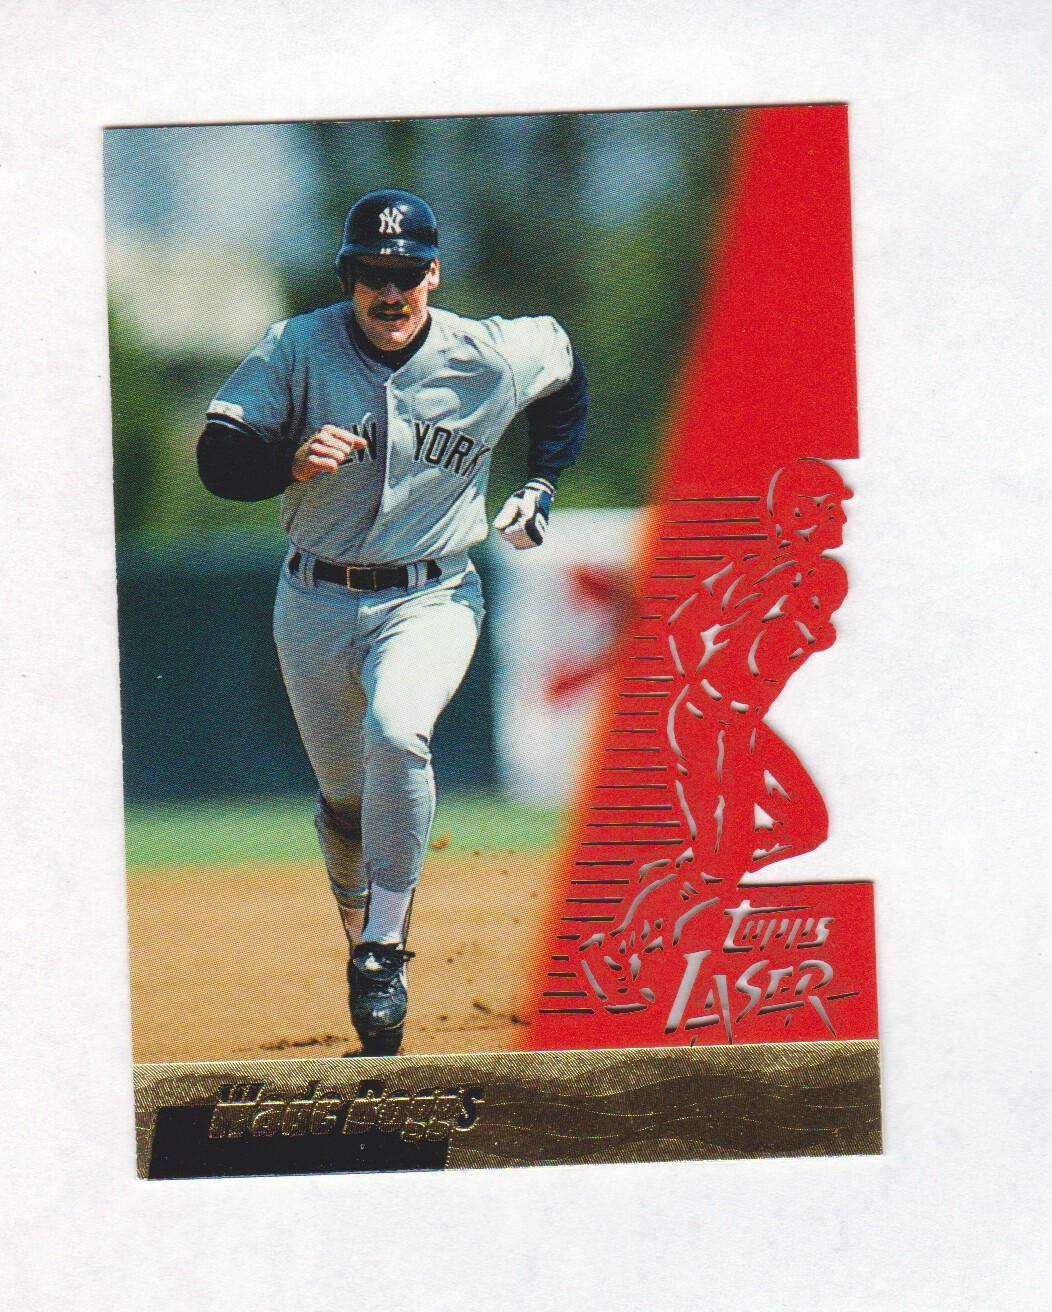 1996 Topps Laser #36 Wade Boggs